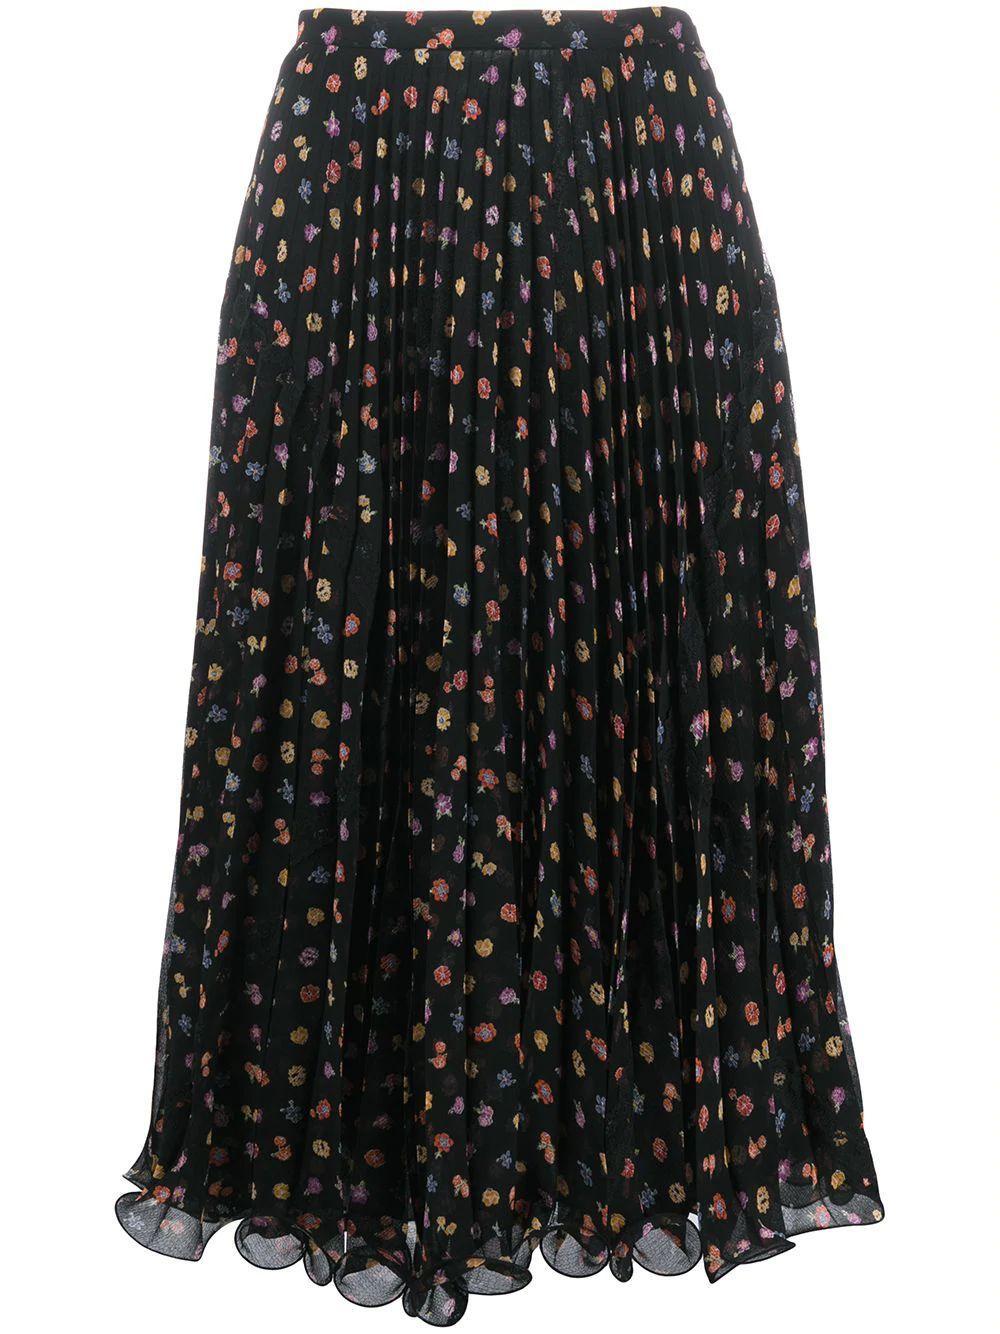 Floral Printed Midi Skirt Item # CHS20AJU02032